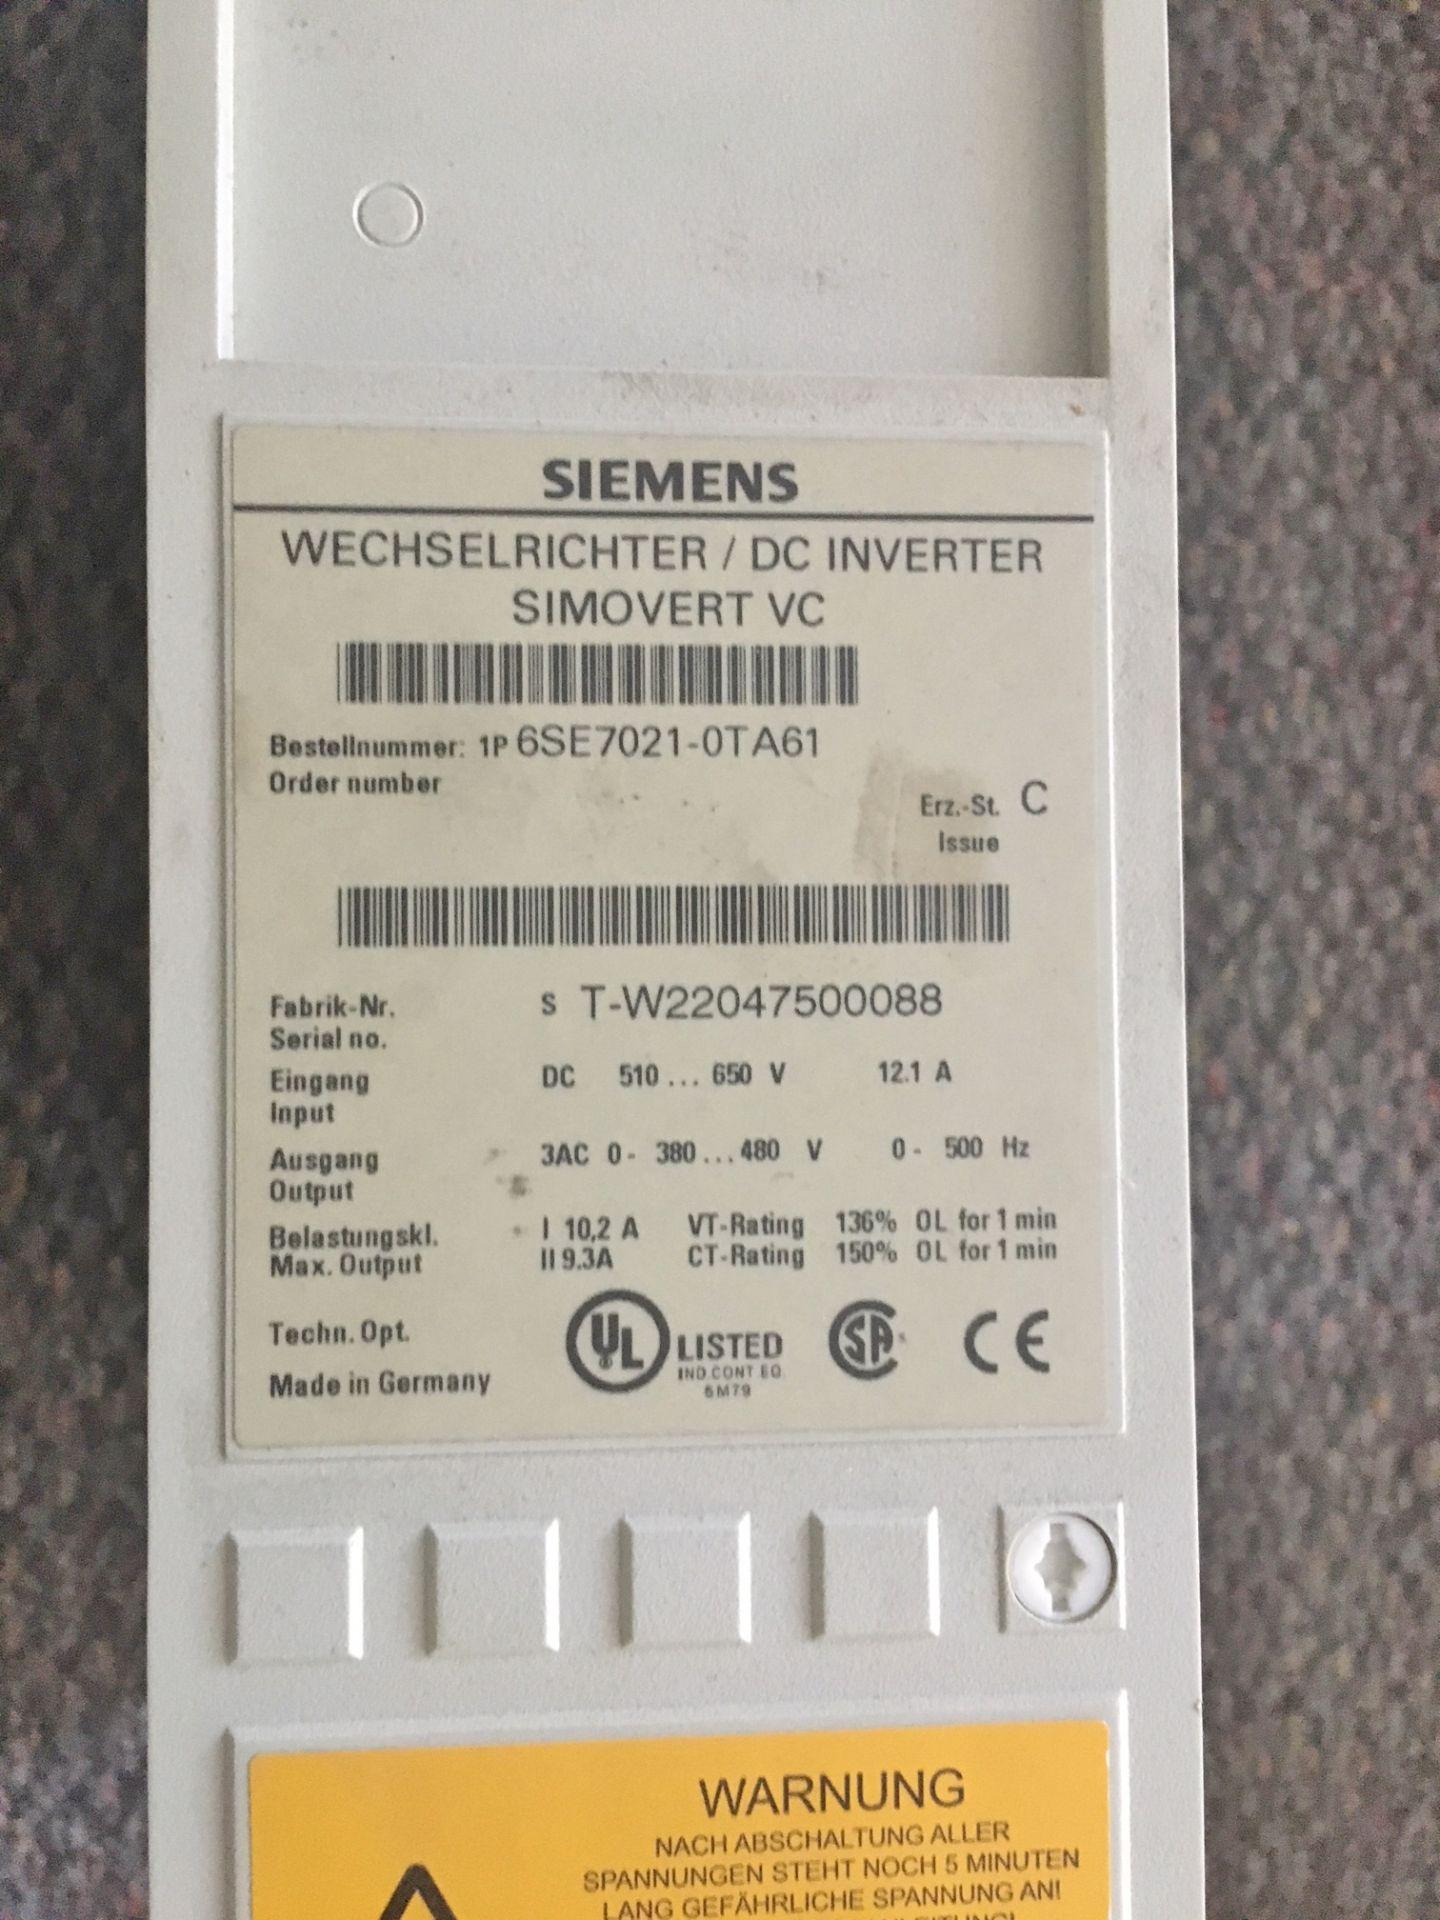 Lot 53 - Lot of 2 Siemens DC Inverter Simovert Drive